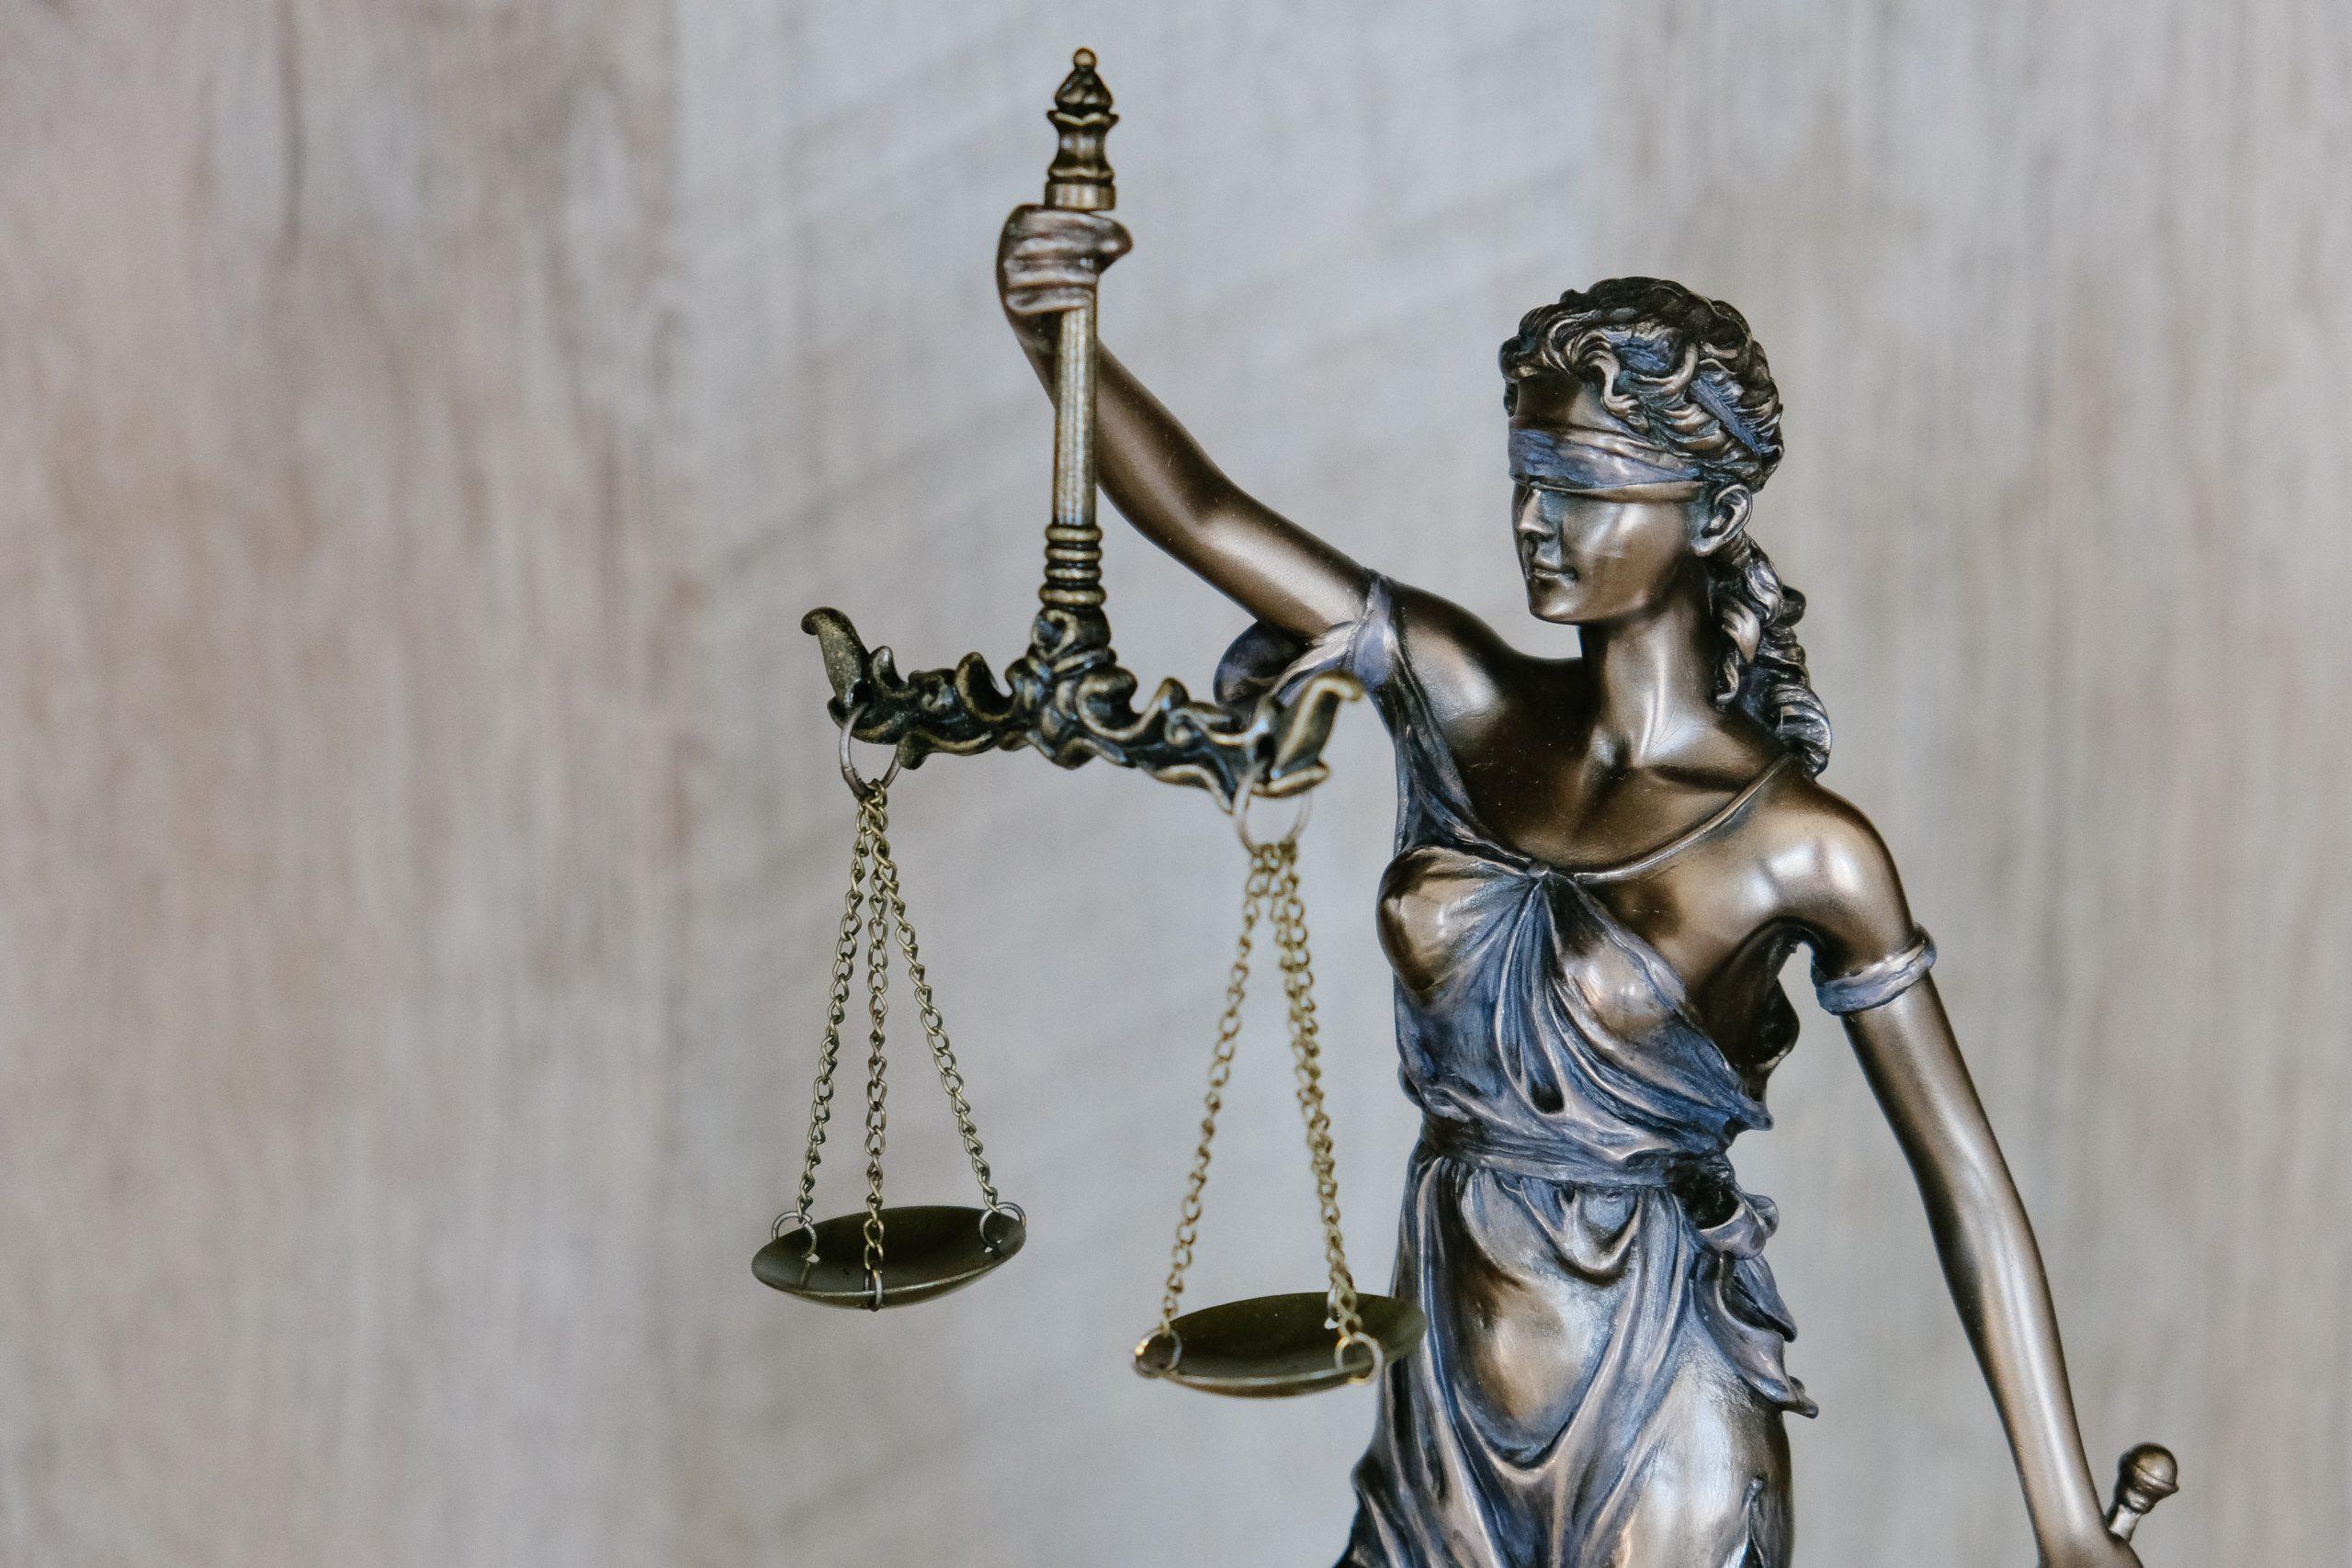 law-restraining-roder-